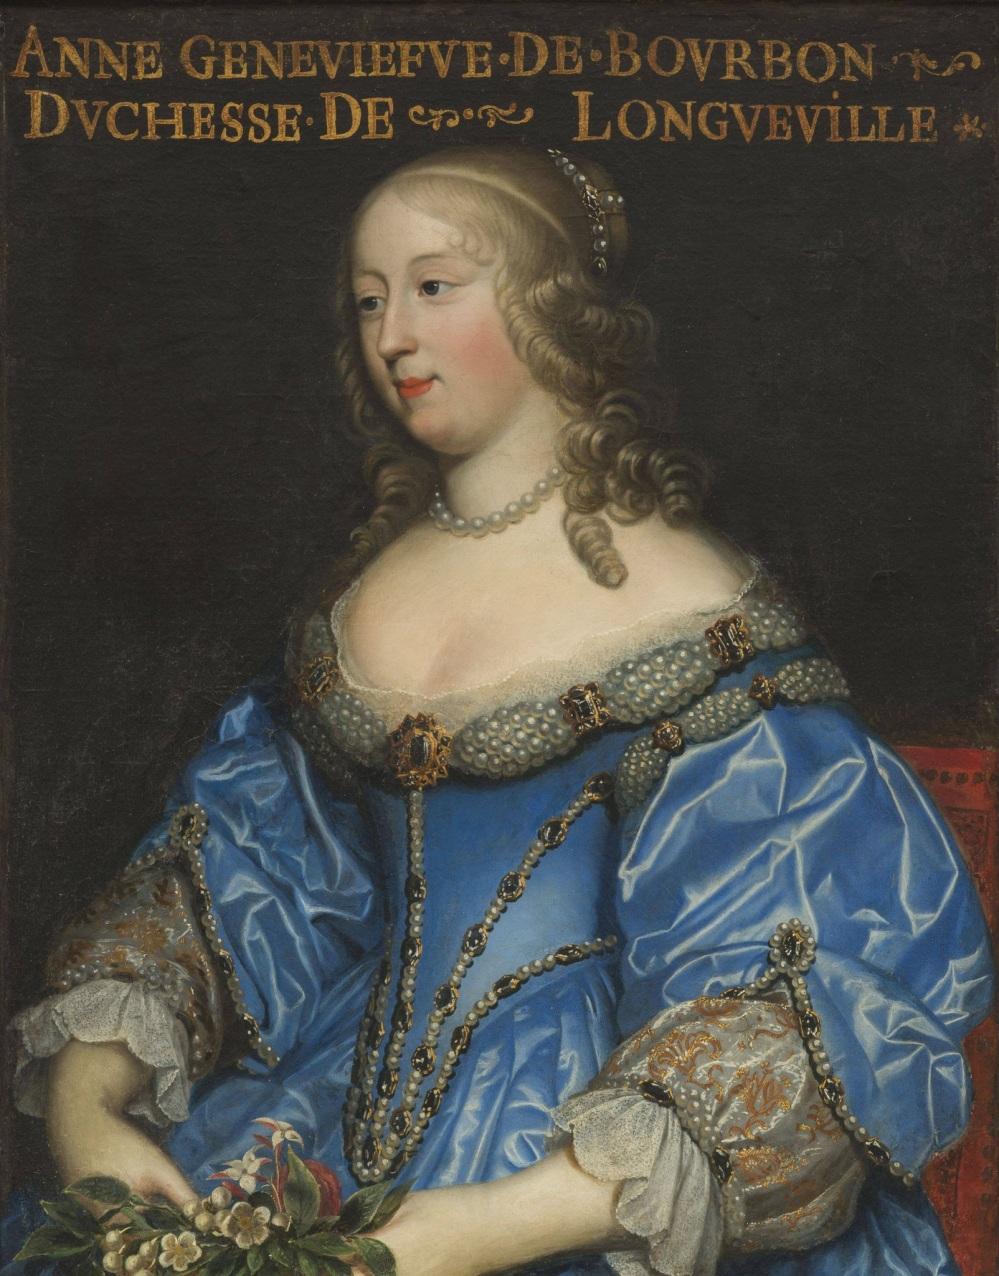 Taller de Charles Beaubrun. Anne Geneviève de Borbón- Condé.Duquesa de Longueville. Mediados del siglo XVII.Museo de Historia de Francia. Palacio de Versalles.